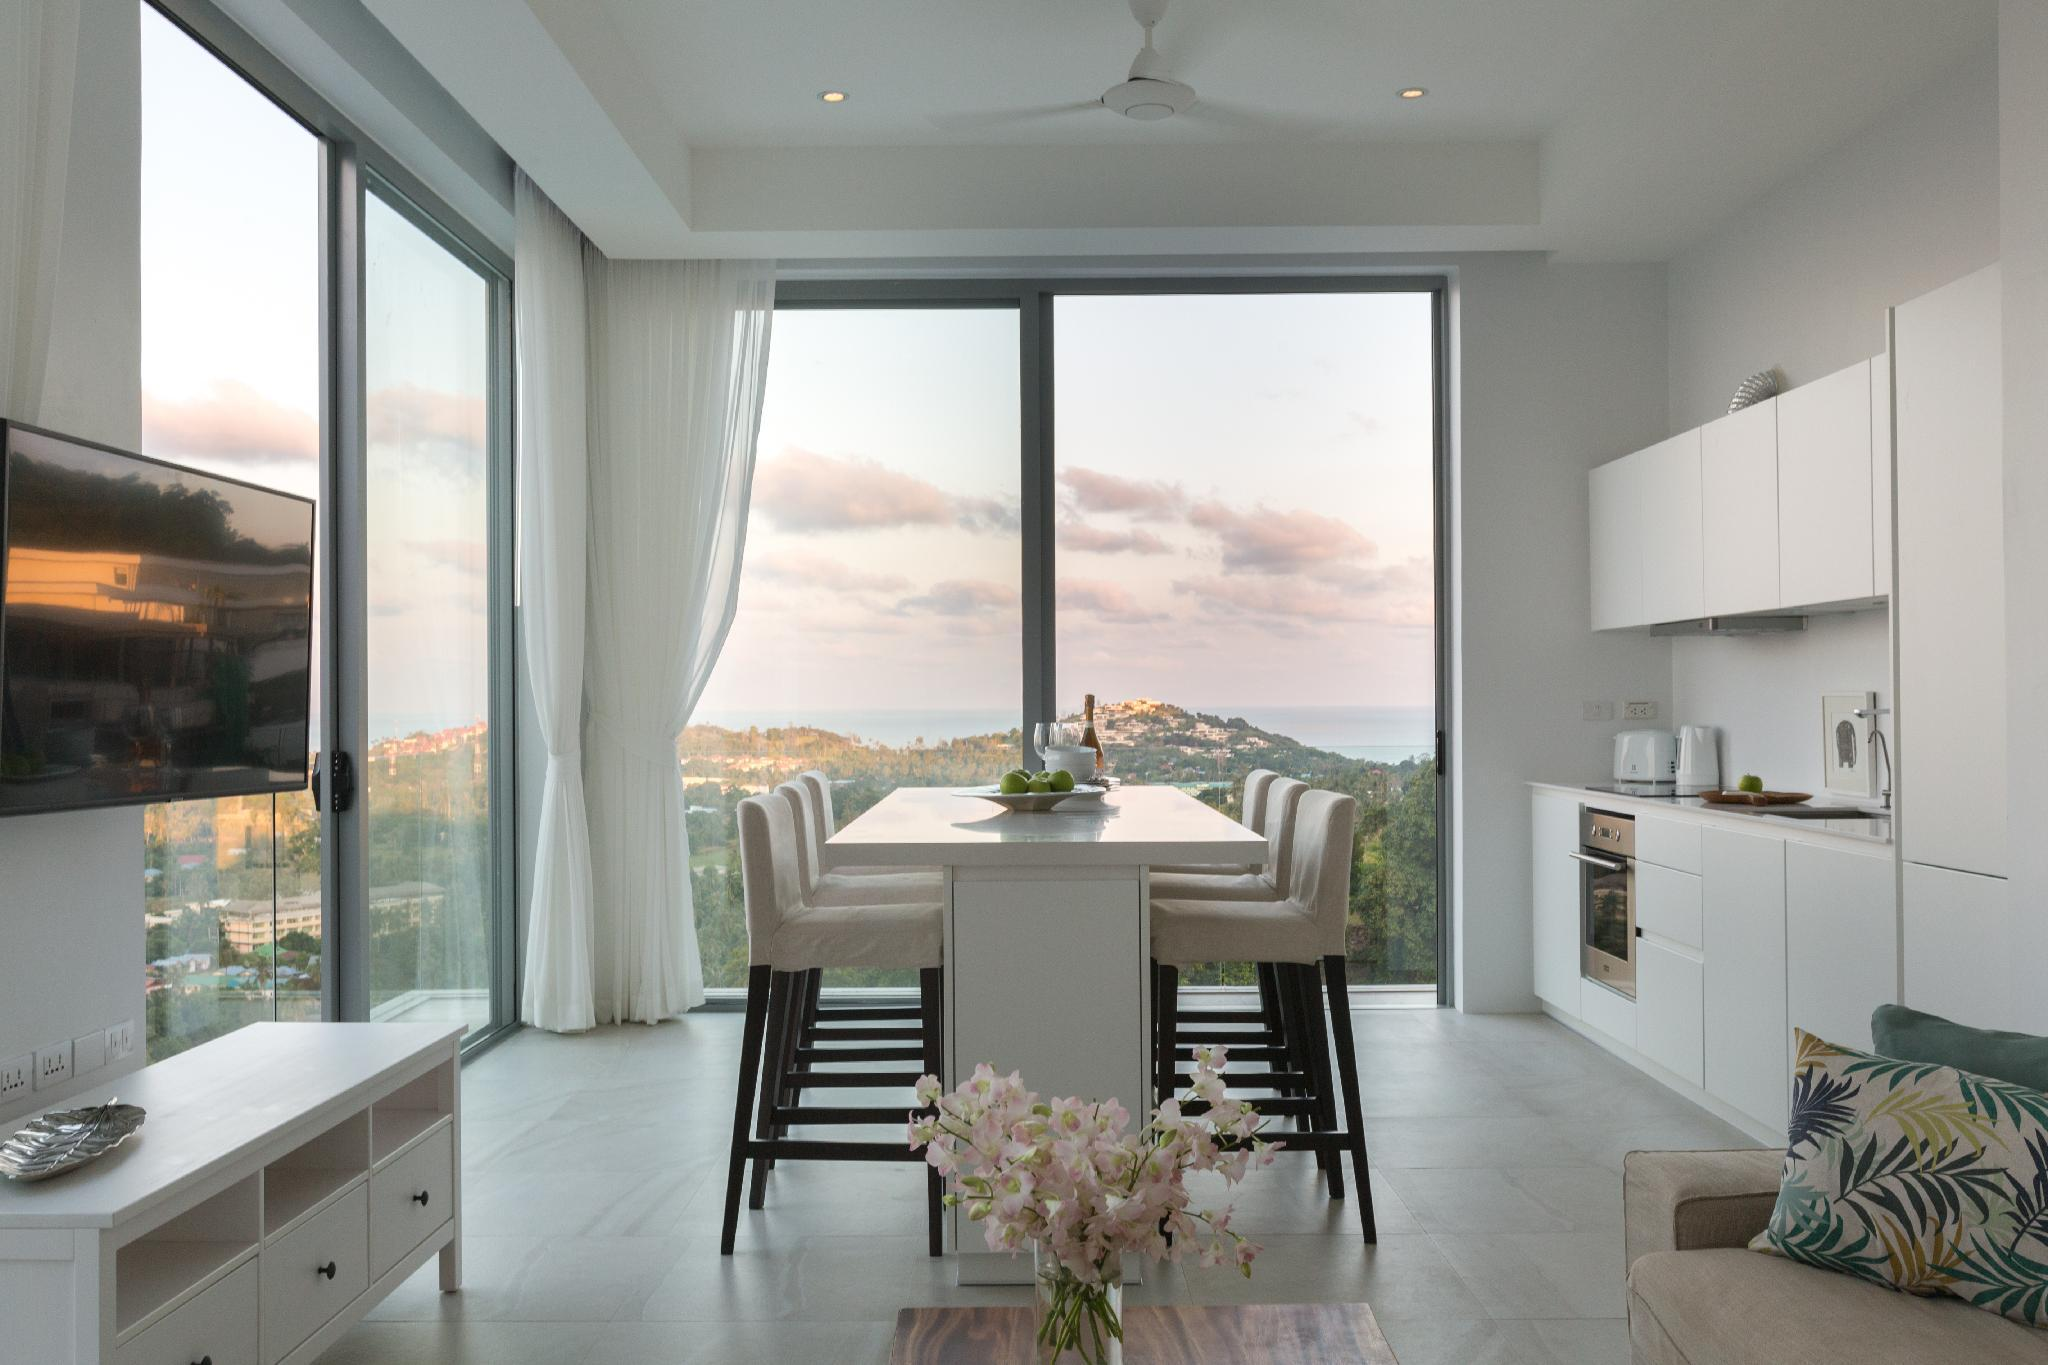 Sam Kah Residence 8 Suite 2